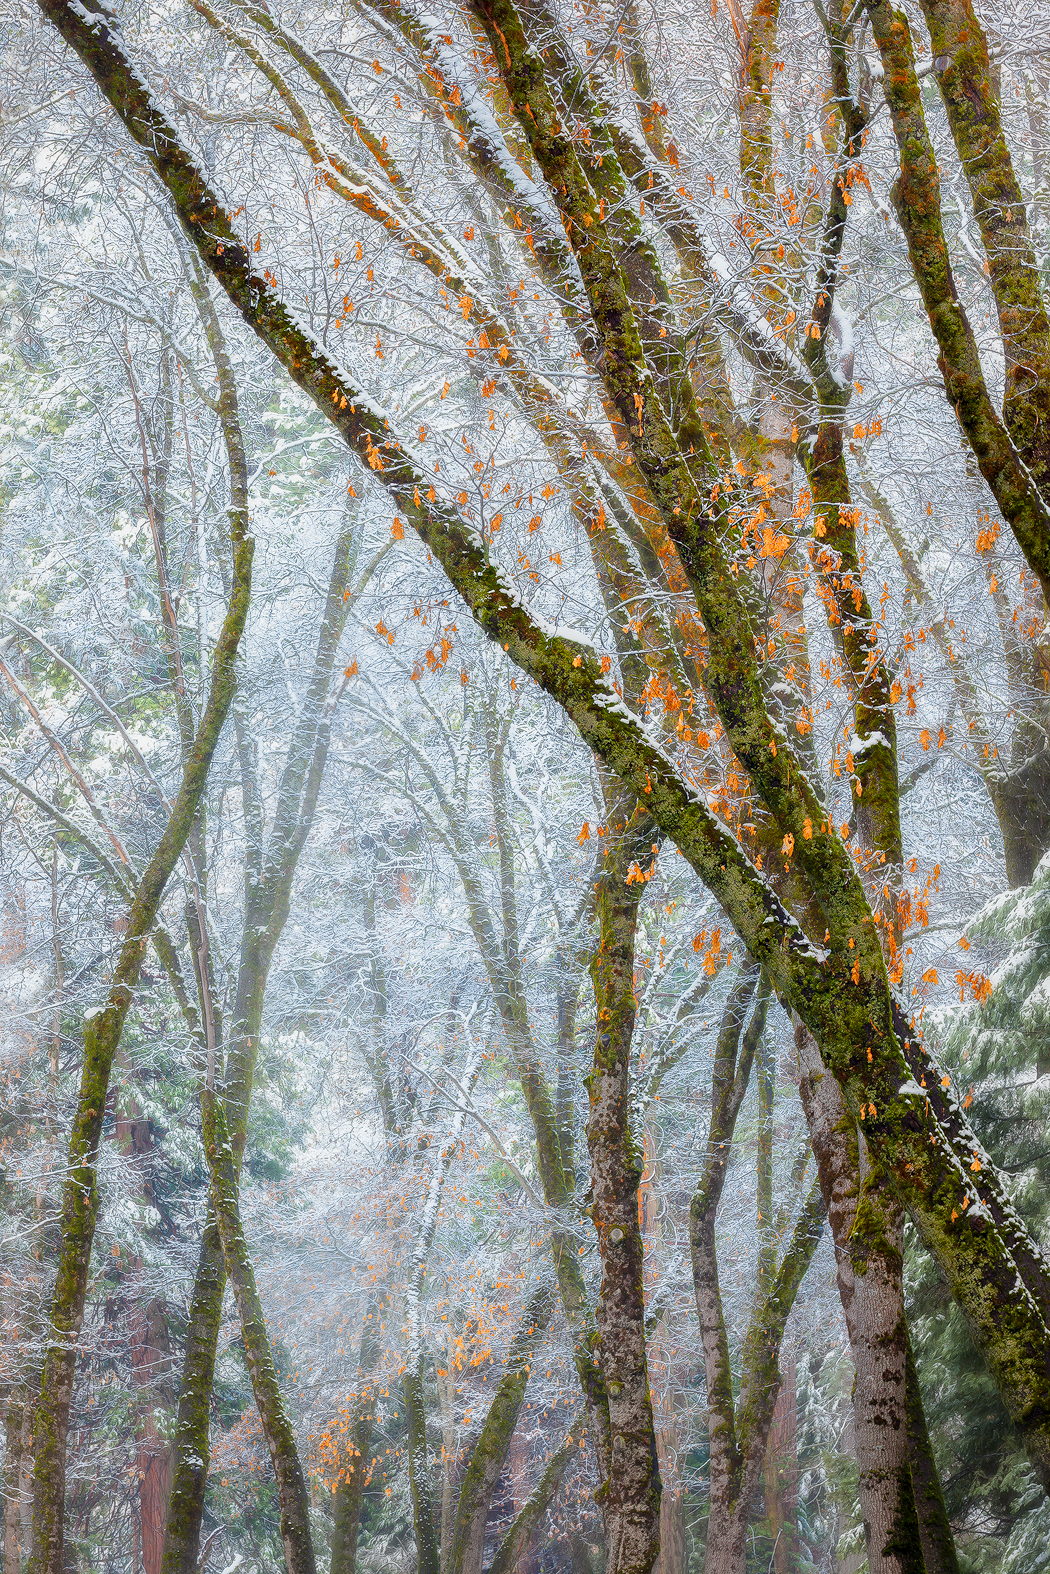 Black oaks and snowy mist qvlvy1